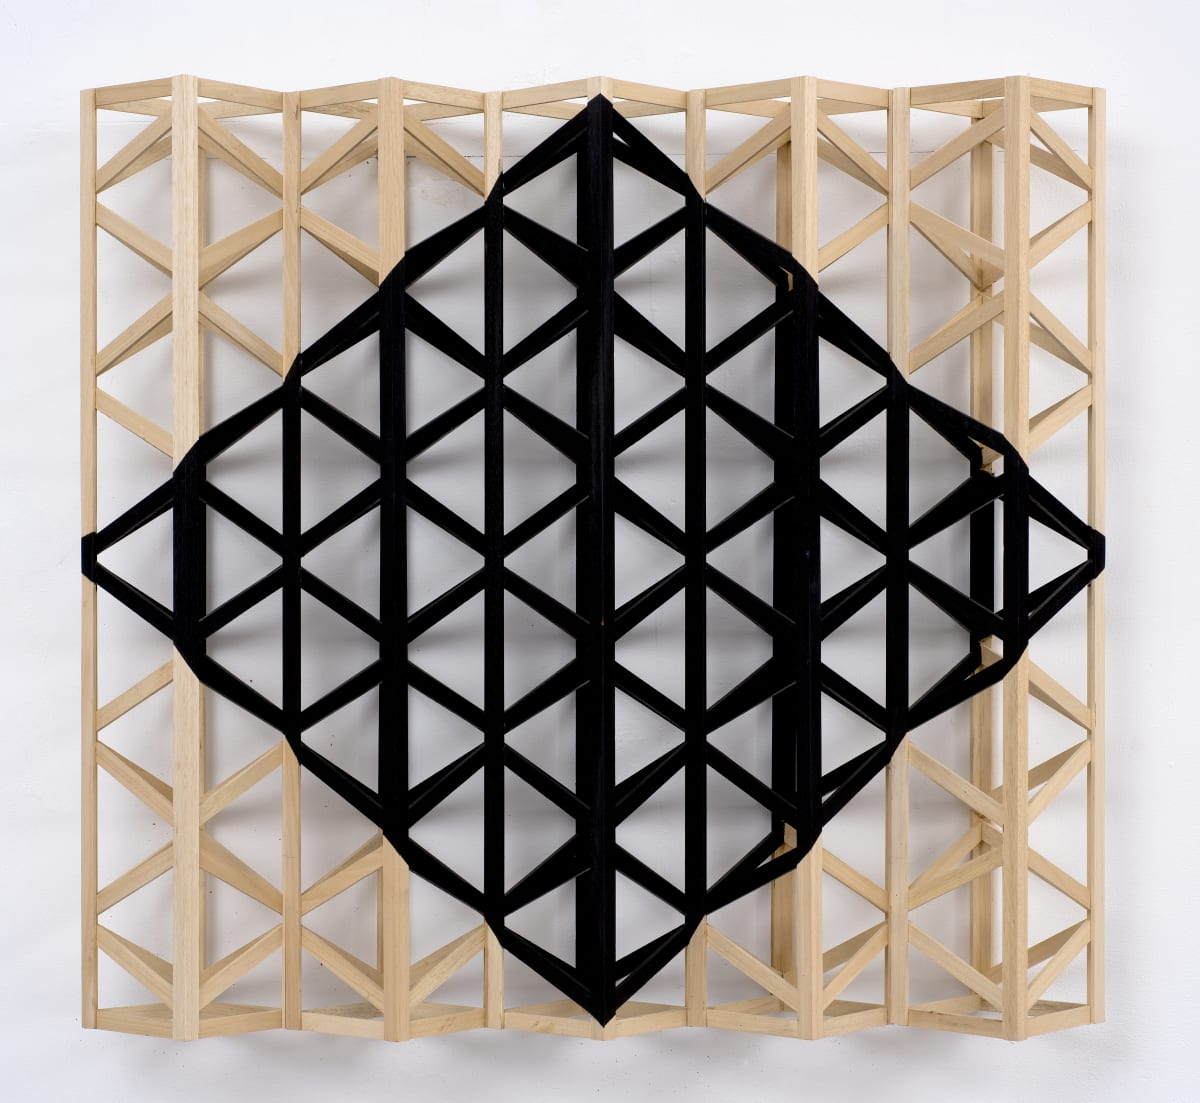 Rasheed Araeen b. 1935One Black Diamond, 2019 Acrylic on wood Each 80 x 87 x 18 cm 31 1/2 x 34 1/4 x 7 1/8 in